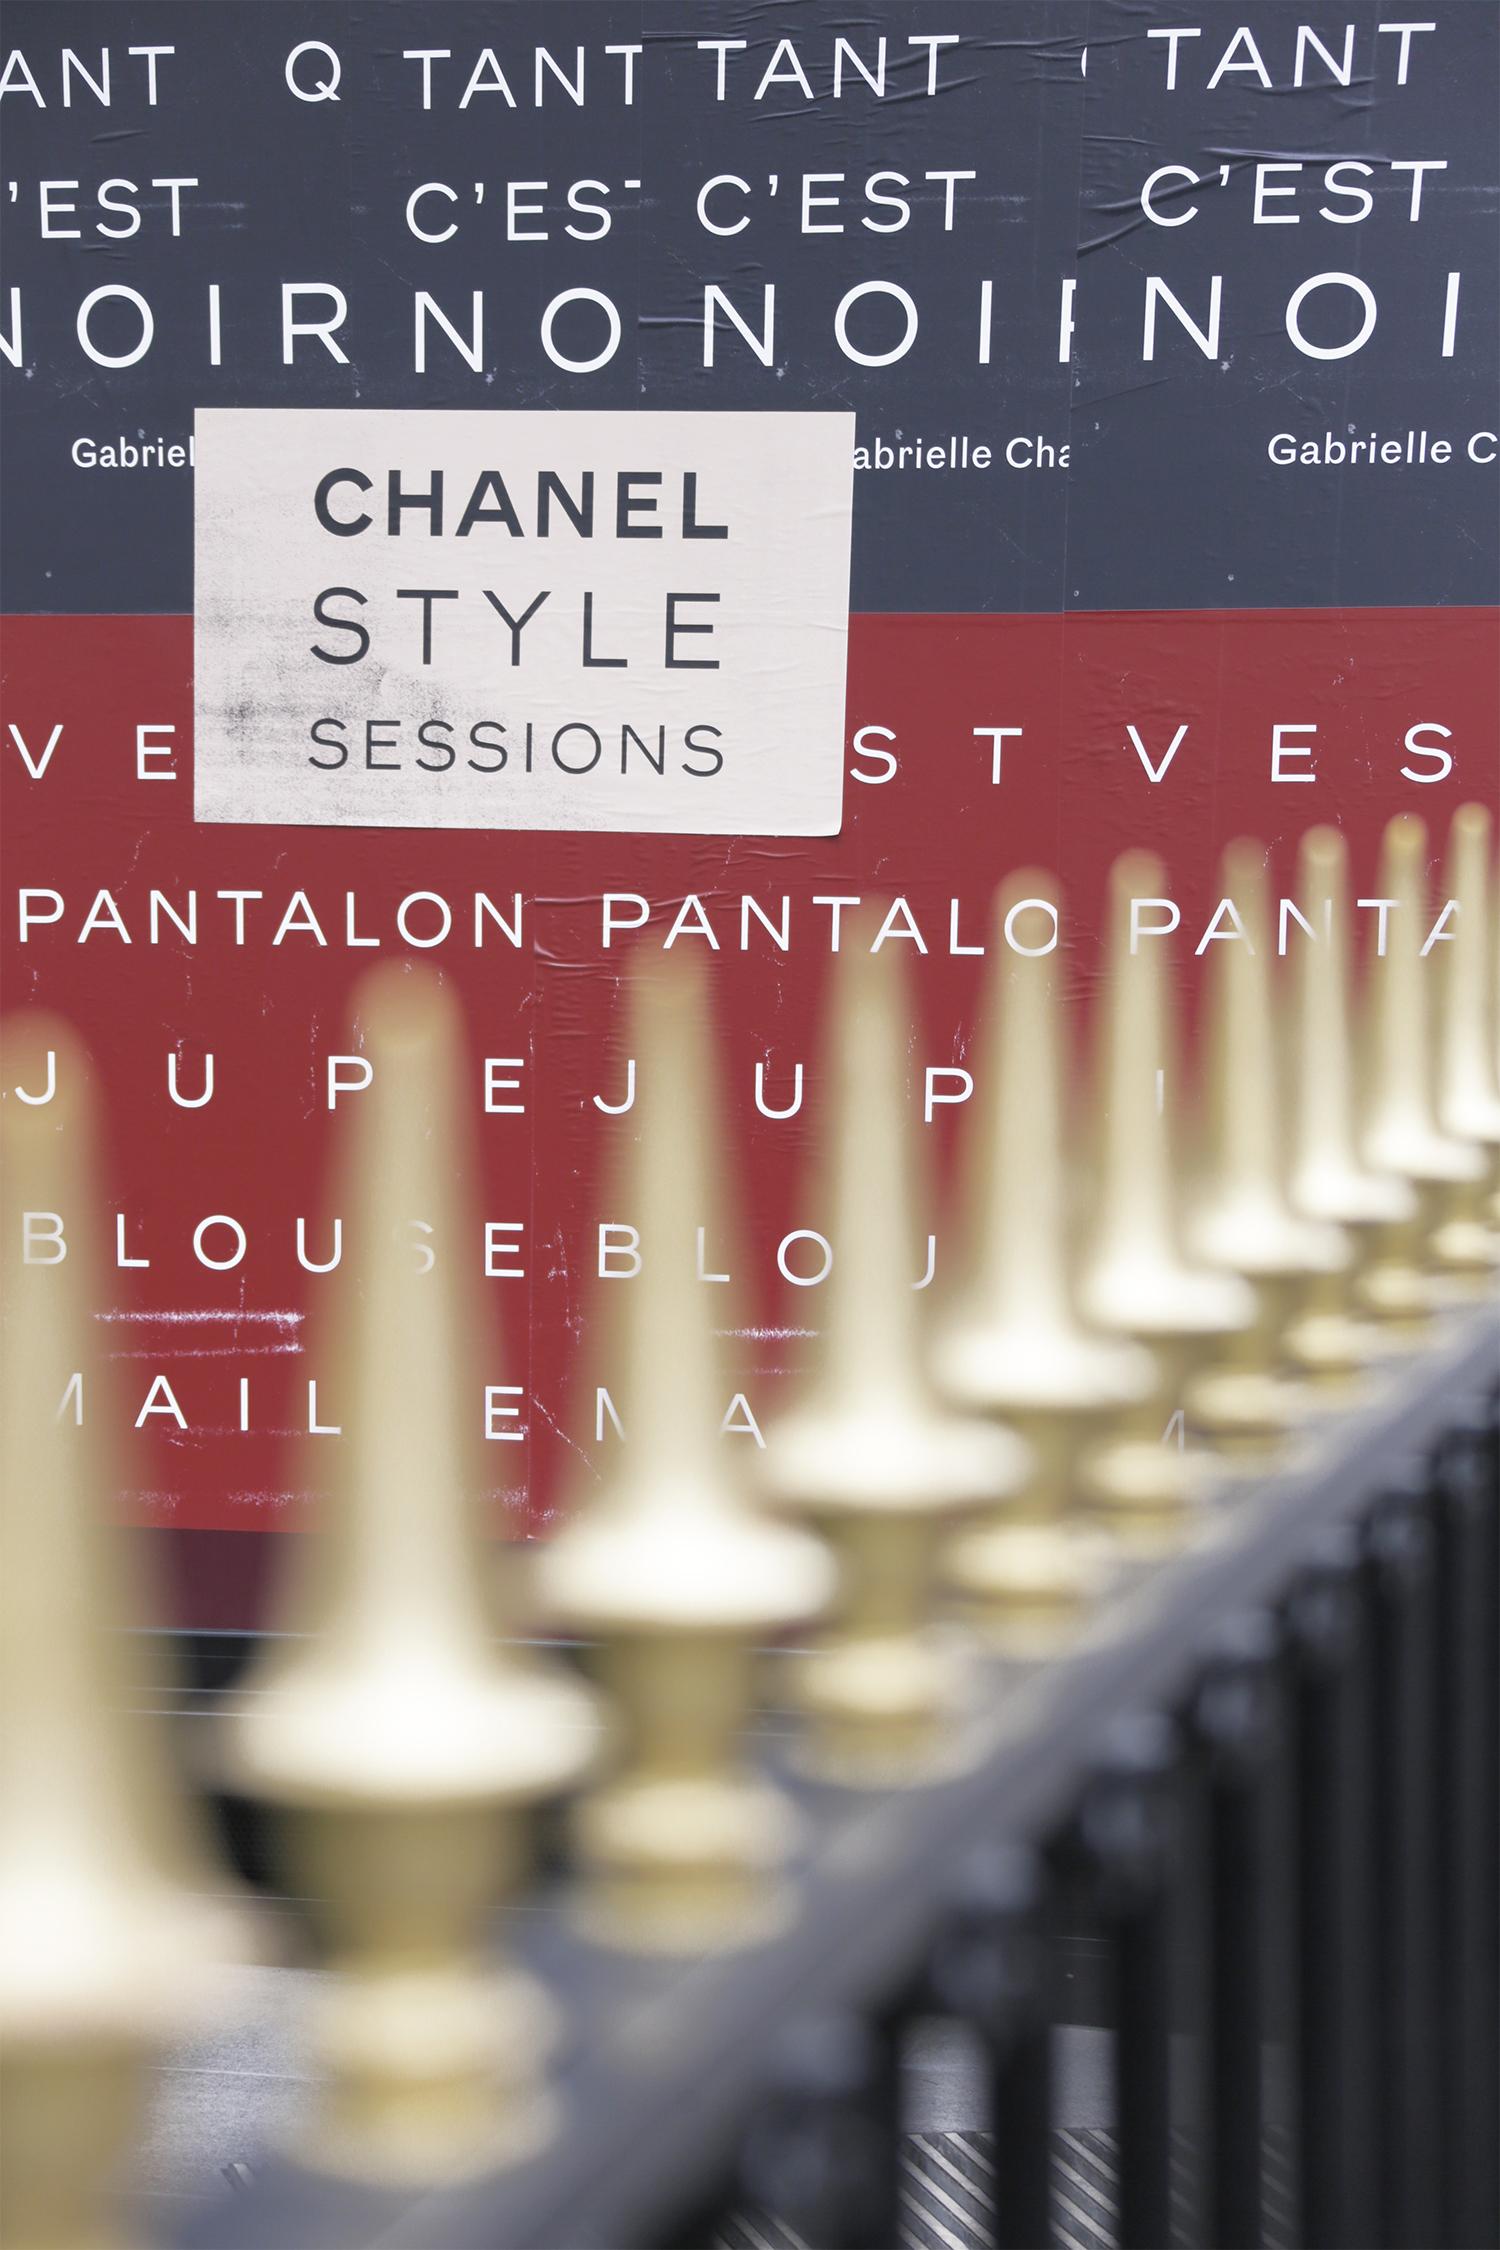 04_chanel-style-sessions-51-avenue-montaigne-boutique_ld-2